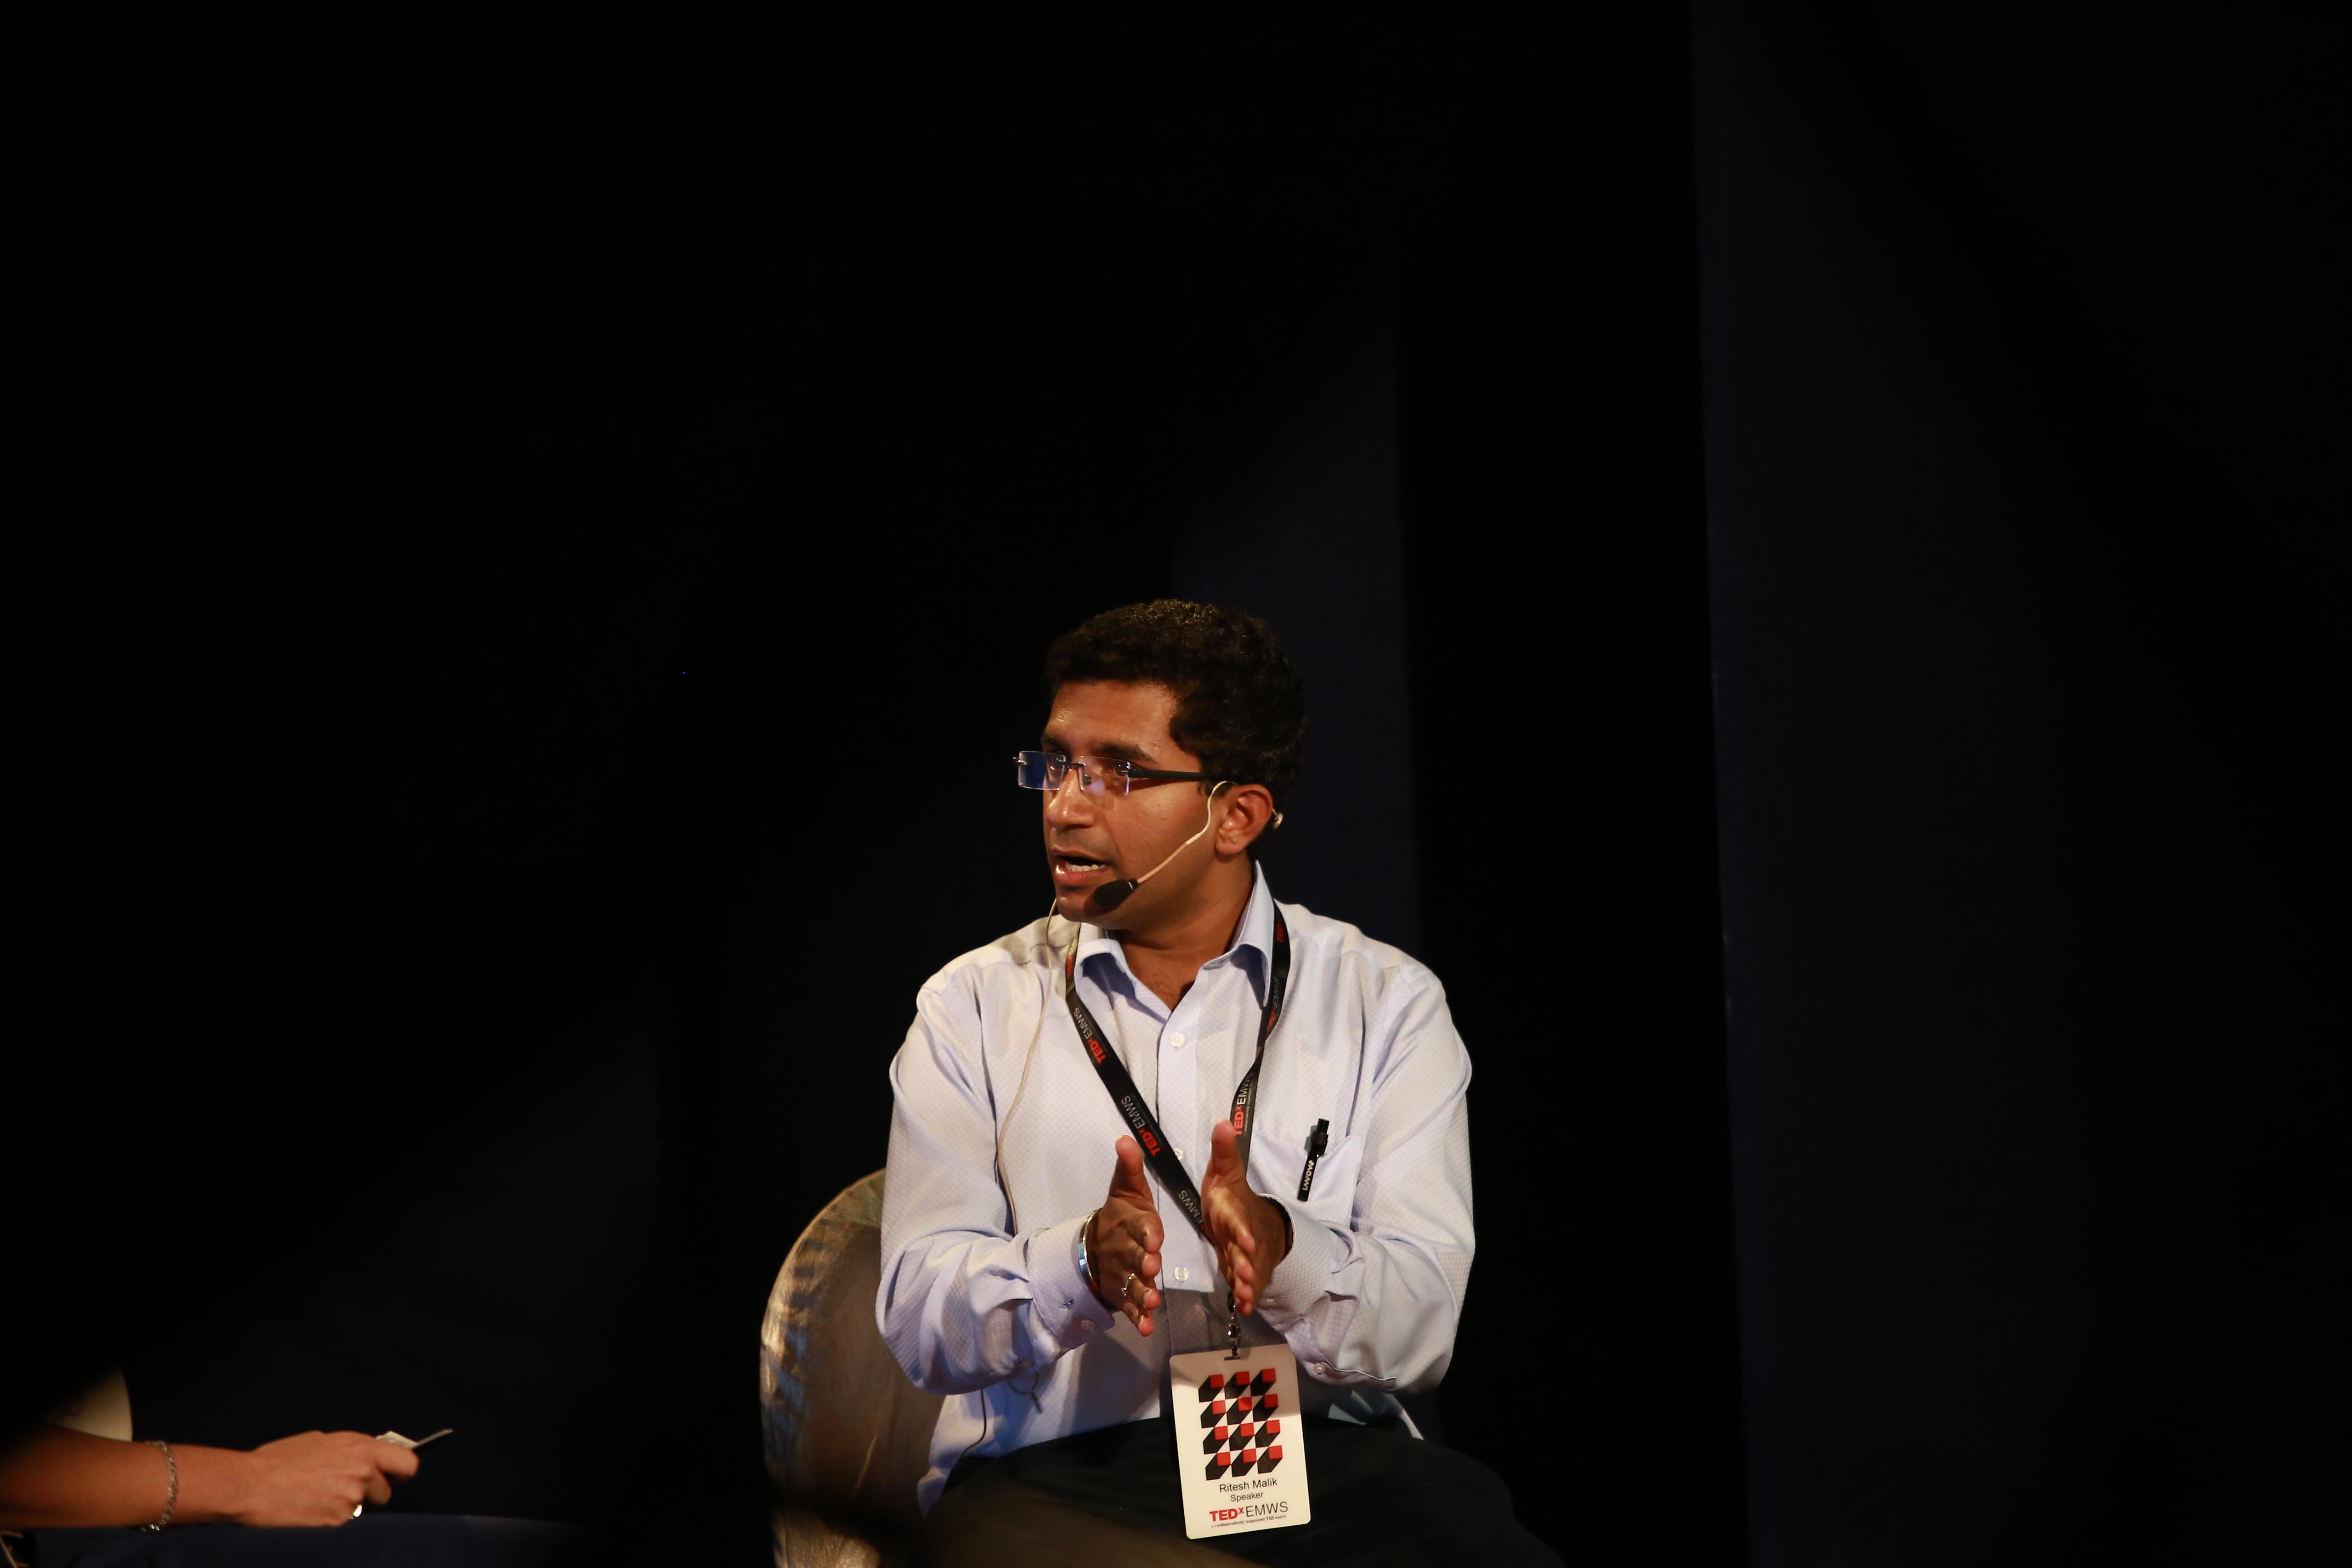 Ritesh Agarwal w 2016 roku, kiedy był gościem konwencji TEDxEMWS 2016 (fot. Shweta Agarwal/TEDxEMWS 2016/flickr.com/CC BY 2.0)